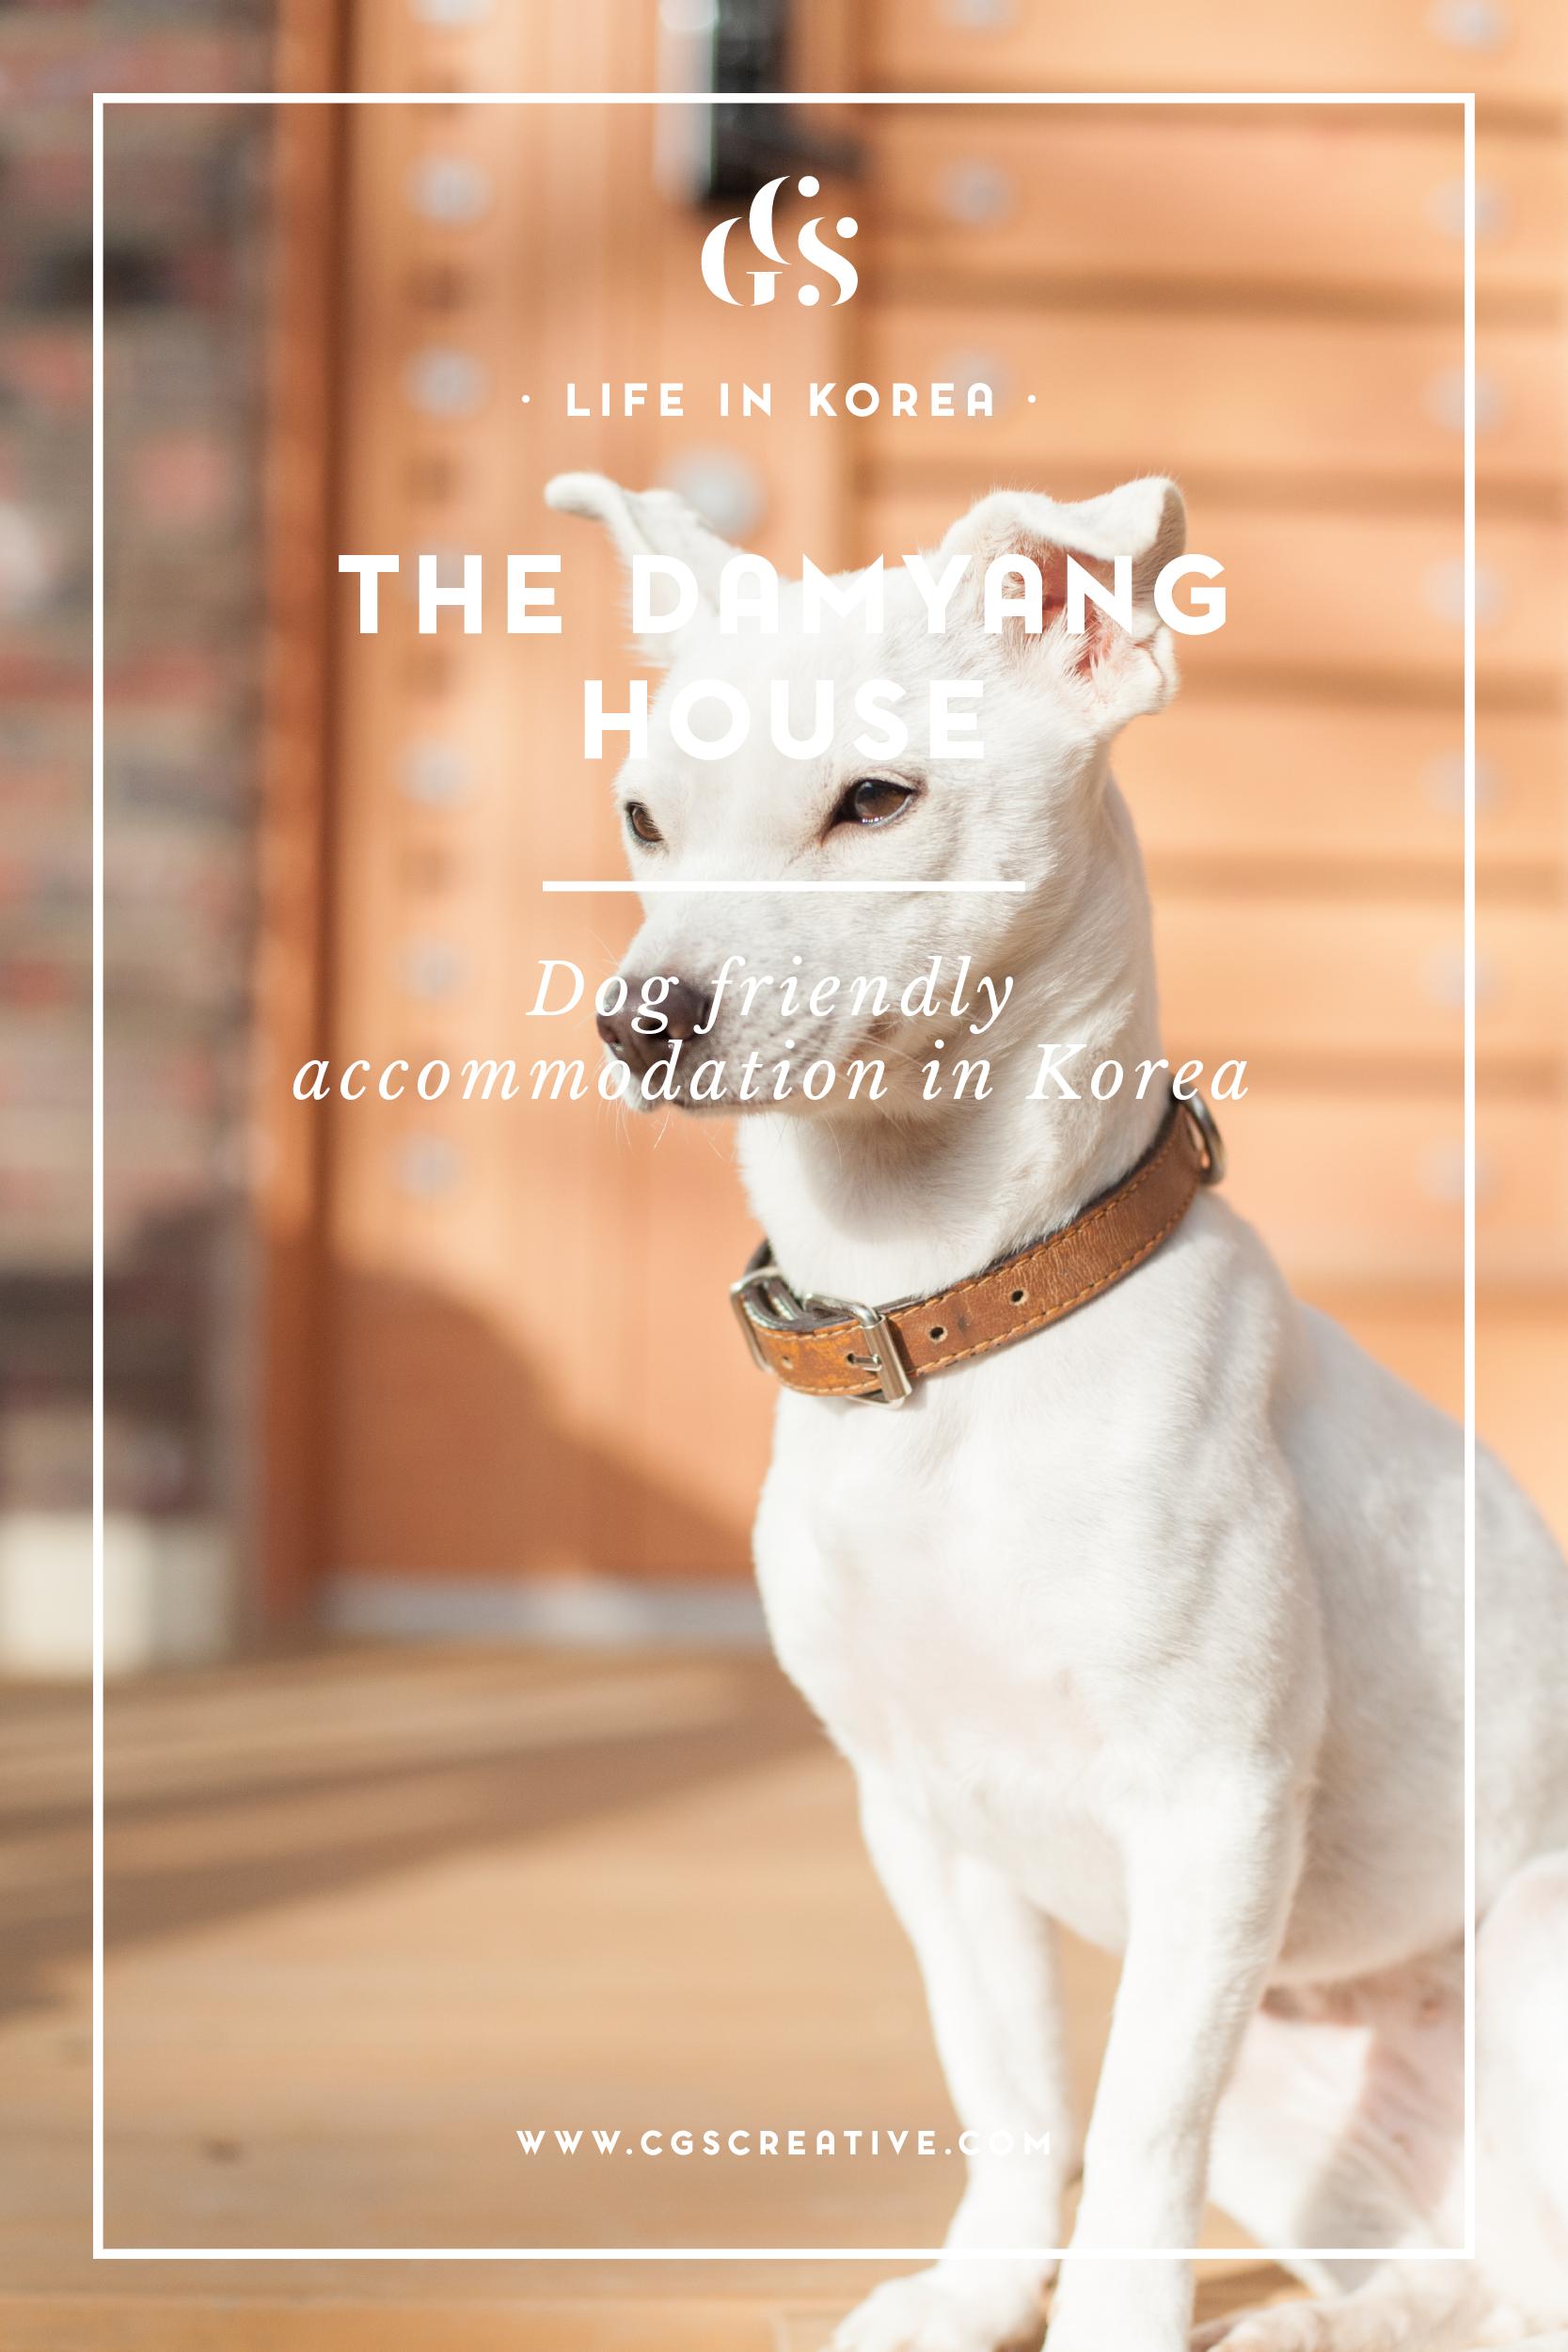 Damyang House dog friendly accommodation in Gwanju South Korea